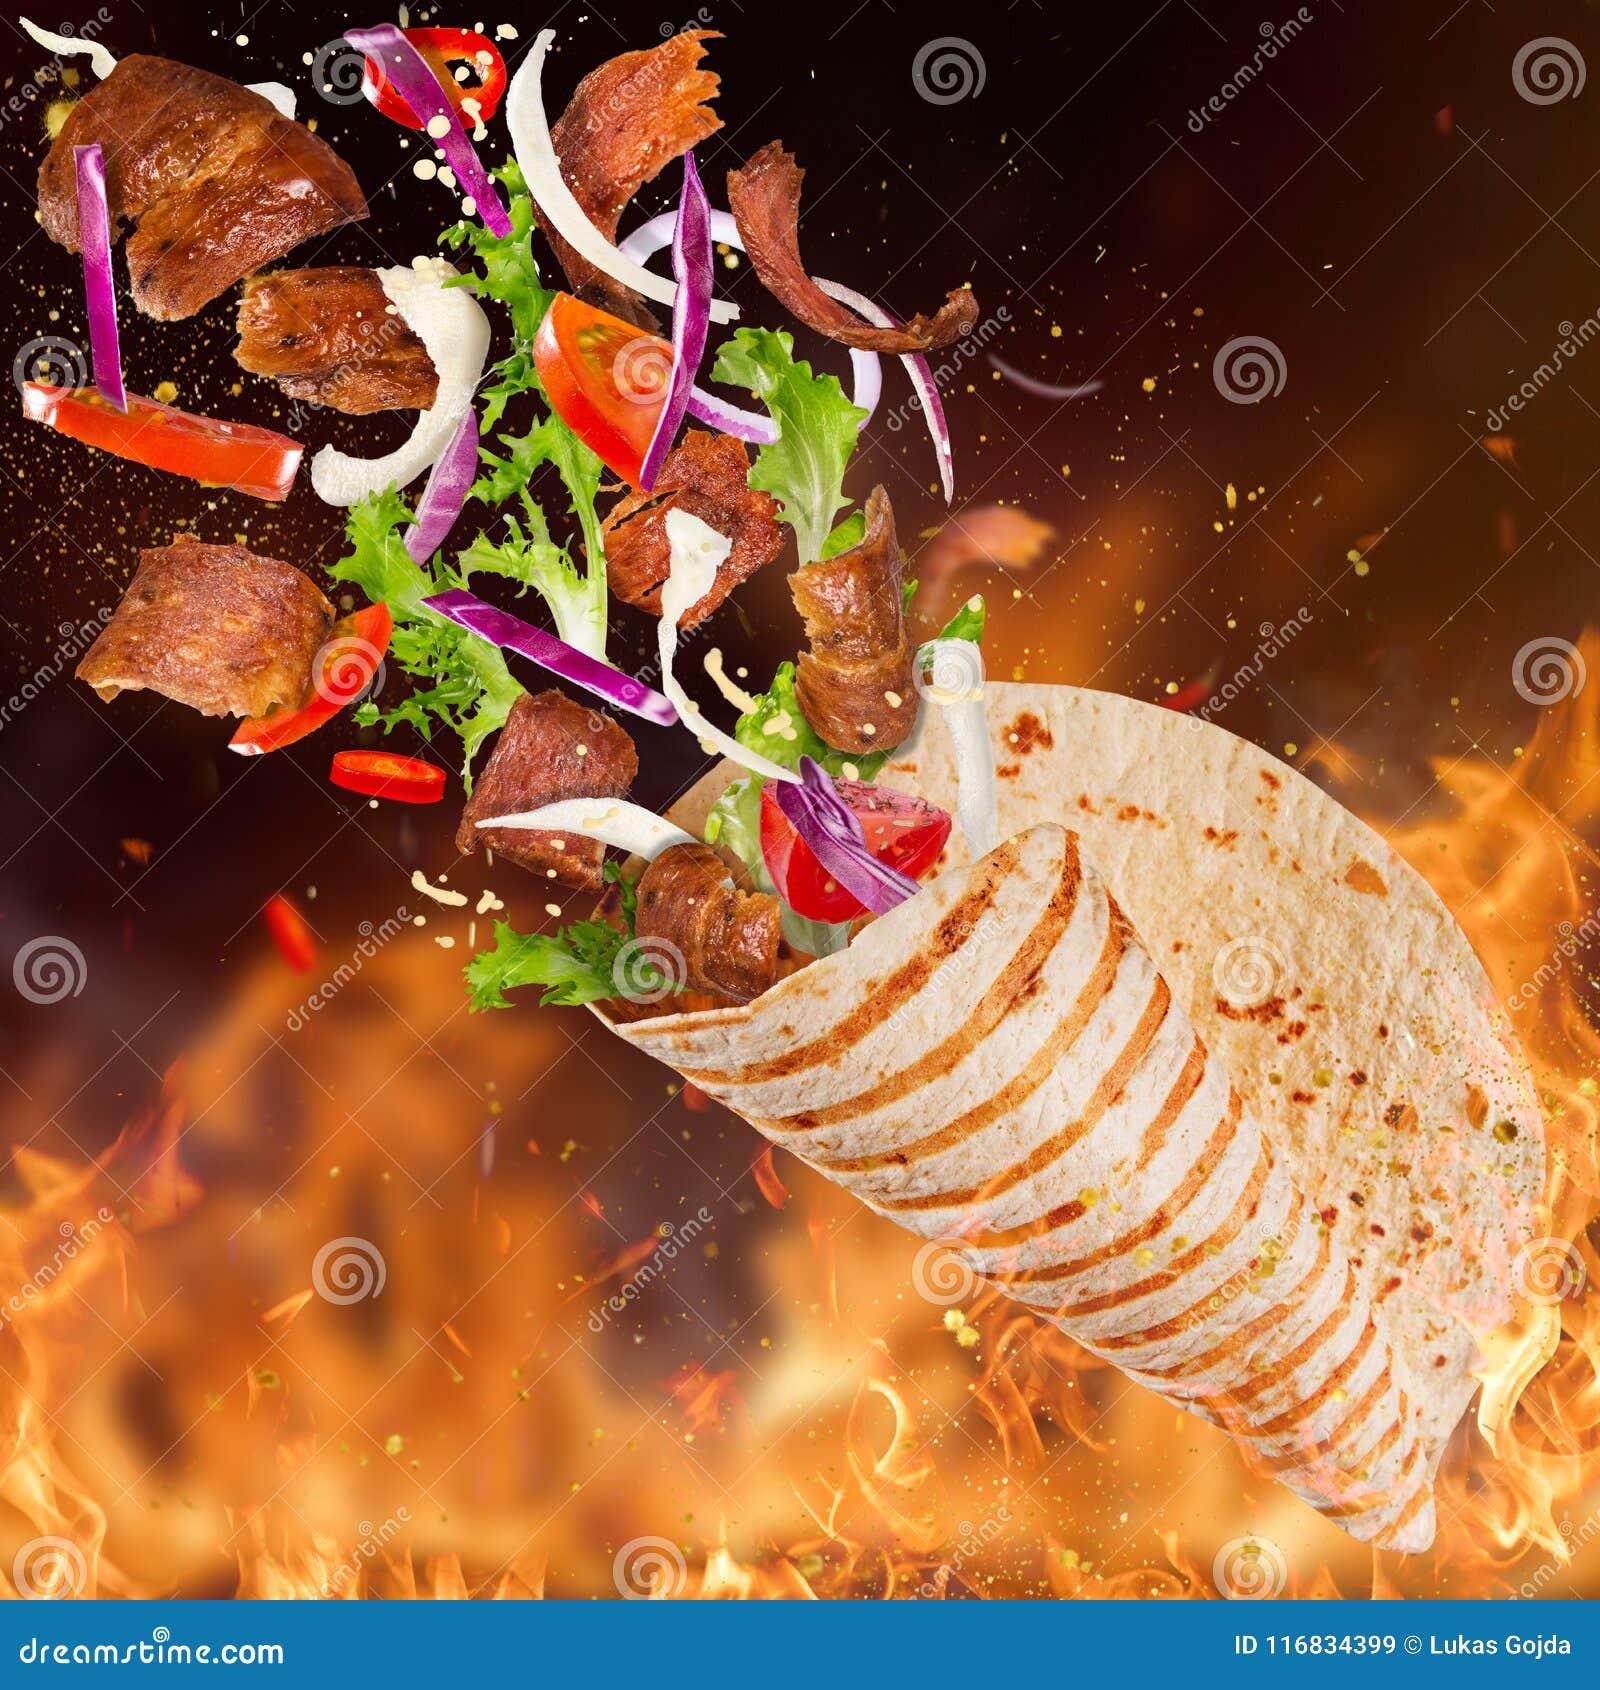 Turkish Kebab Yufka With Flying Ingredients And Flames Stock Image Image Of Food Ingredients 116834399